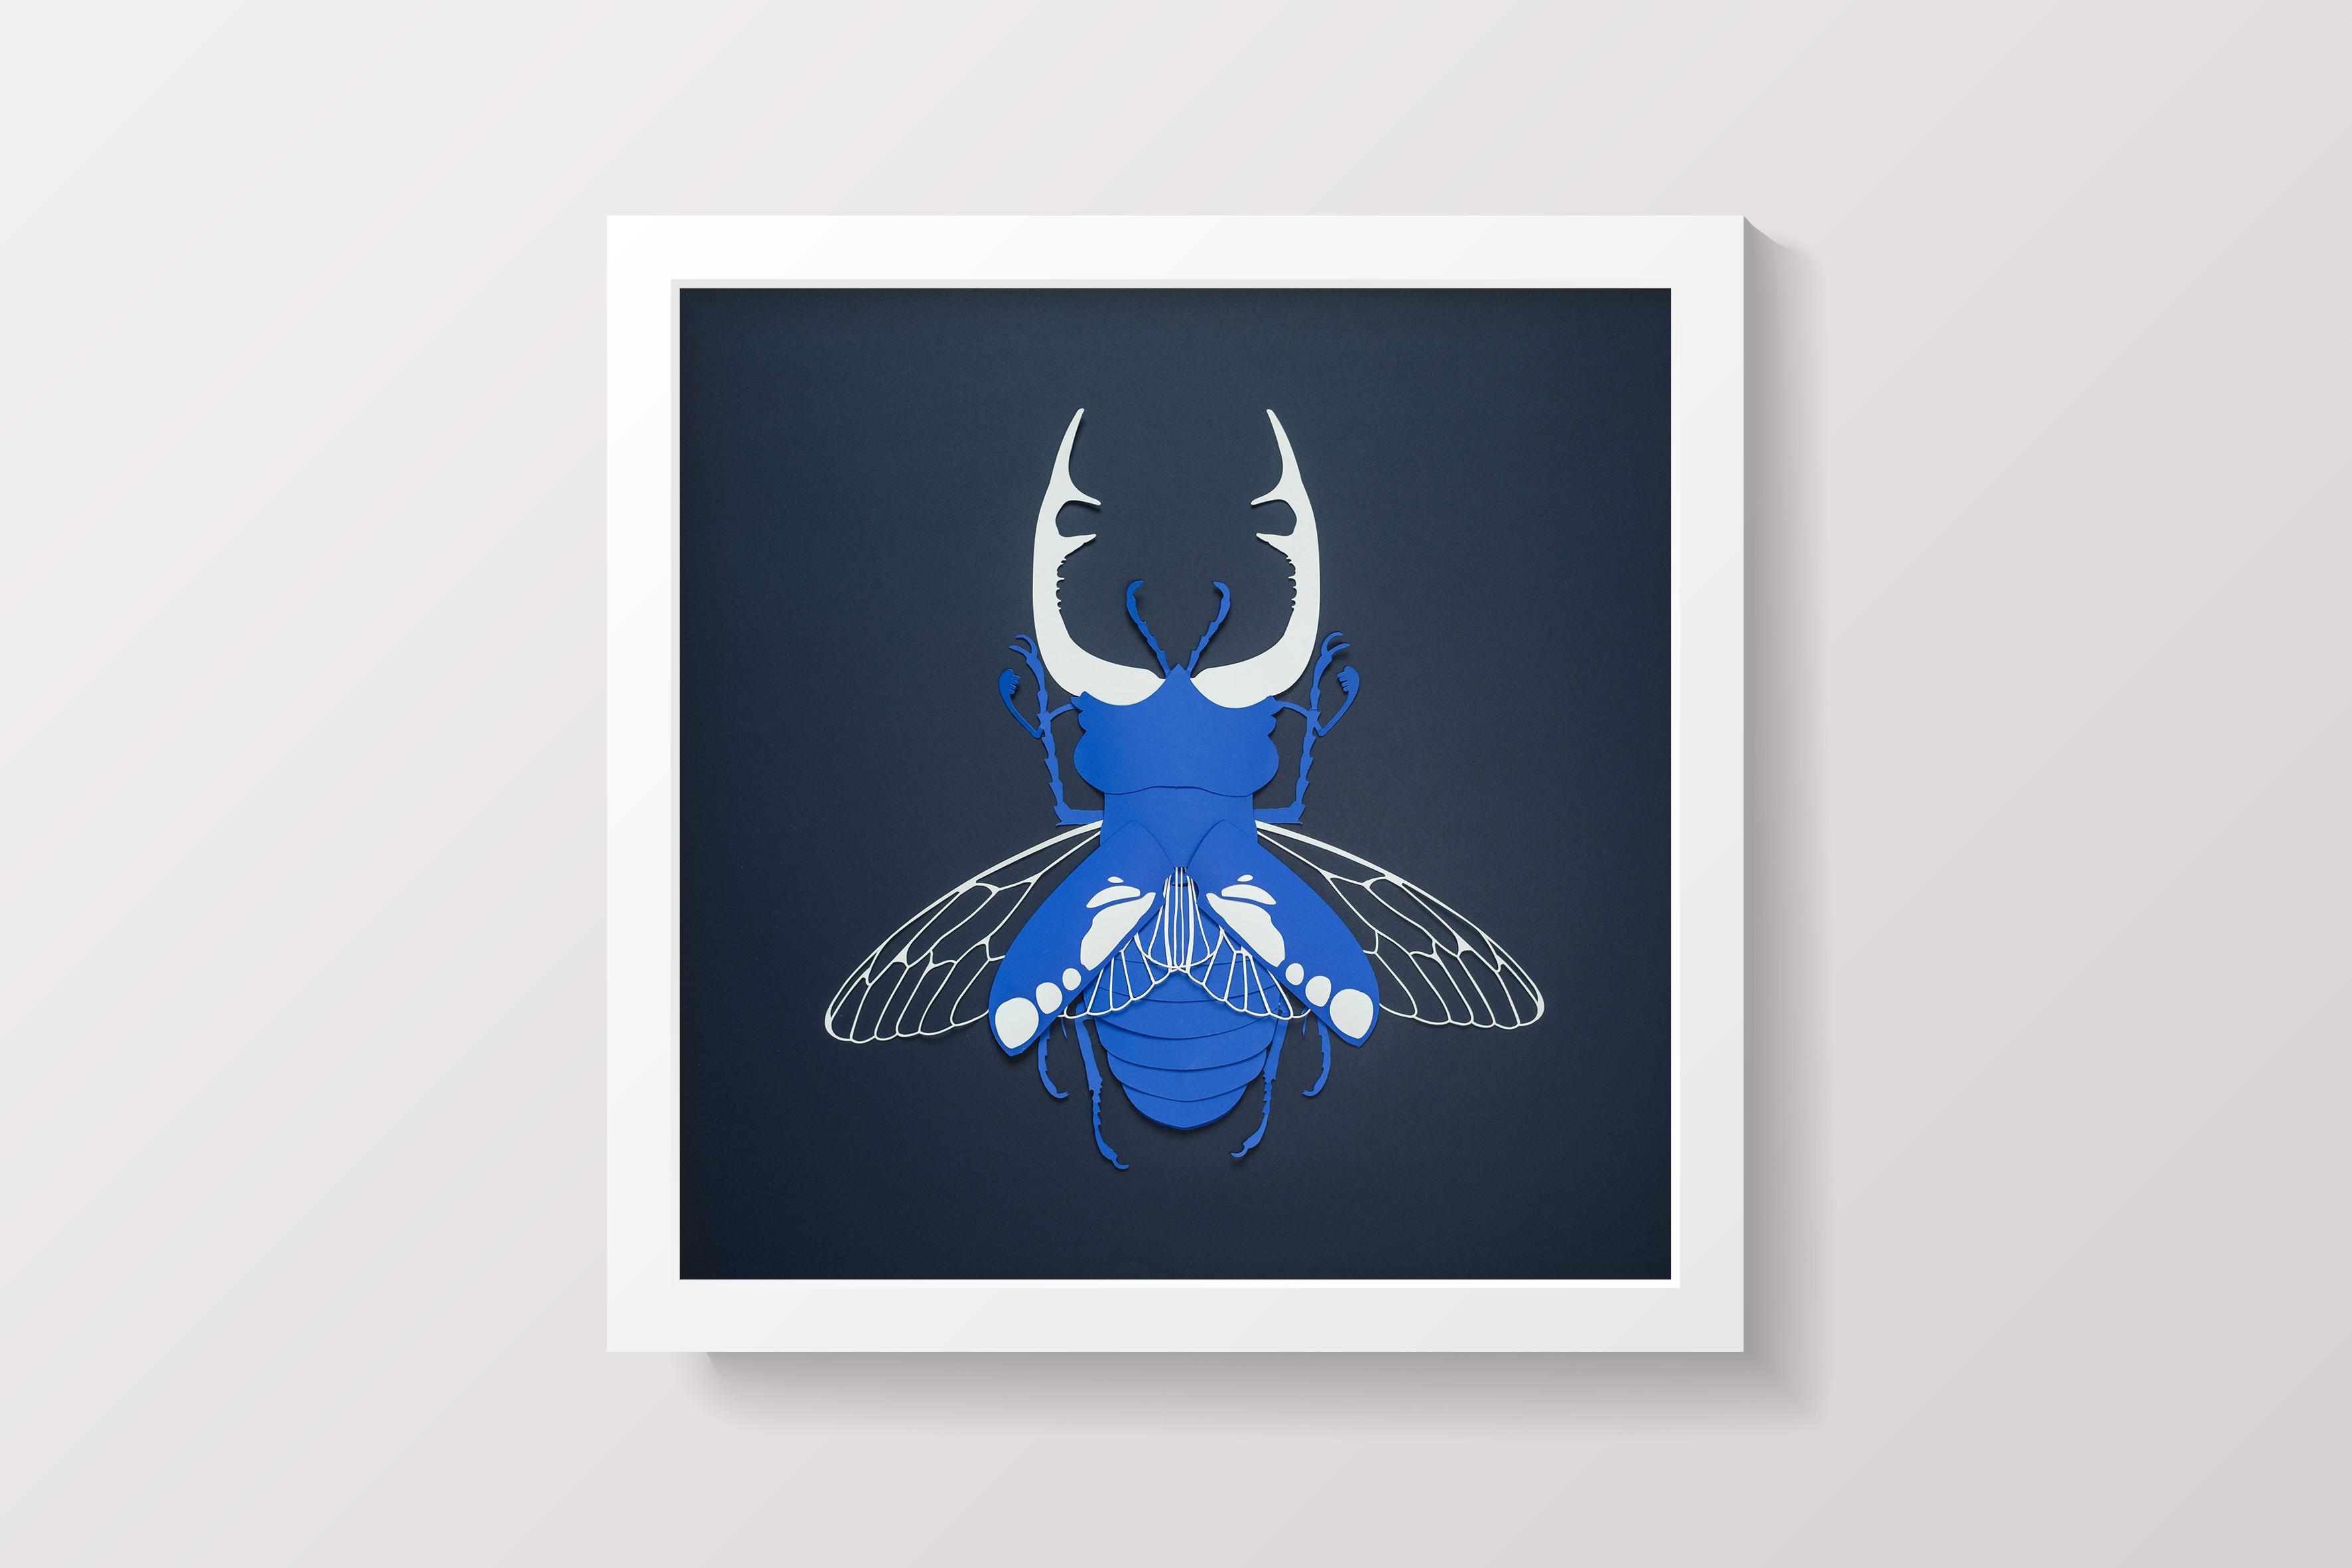 Scarabée bleu cadre blanc